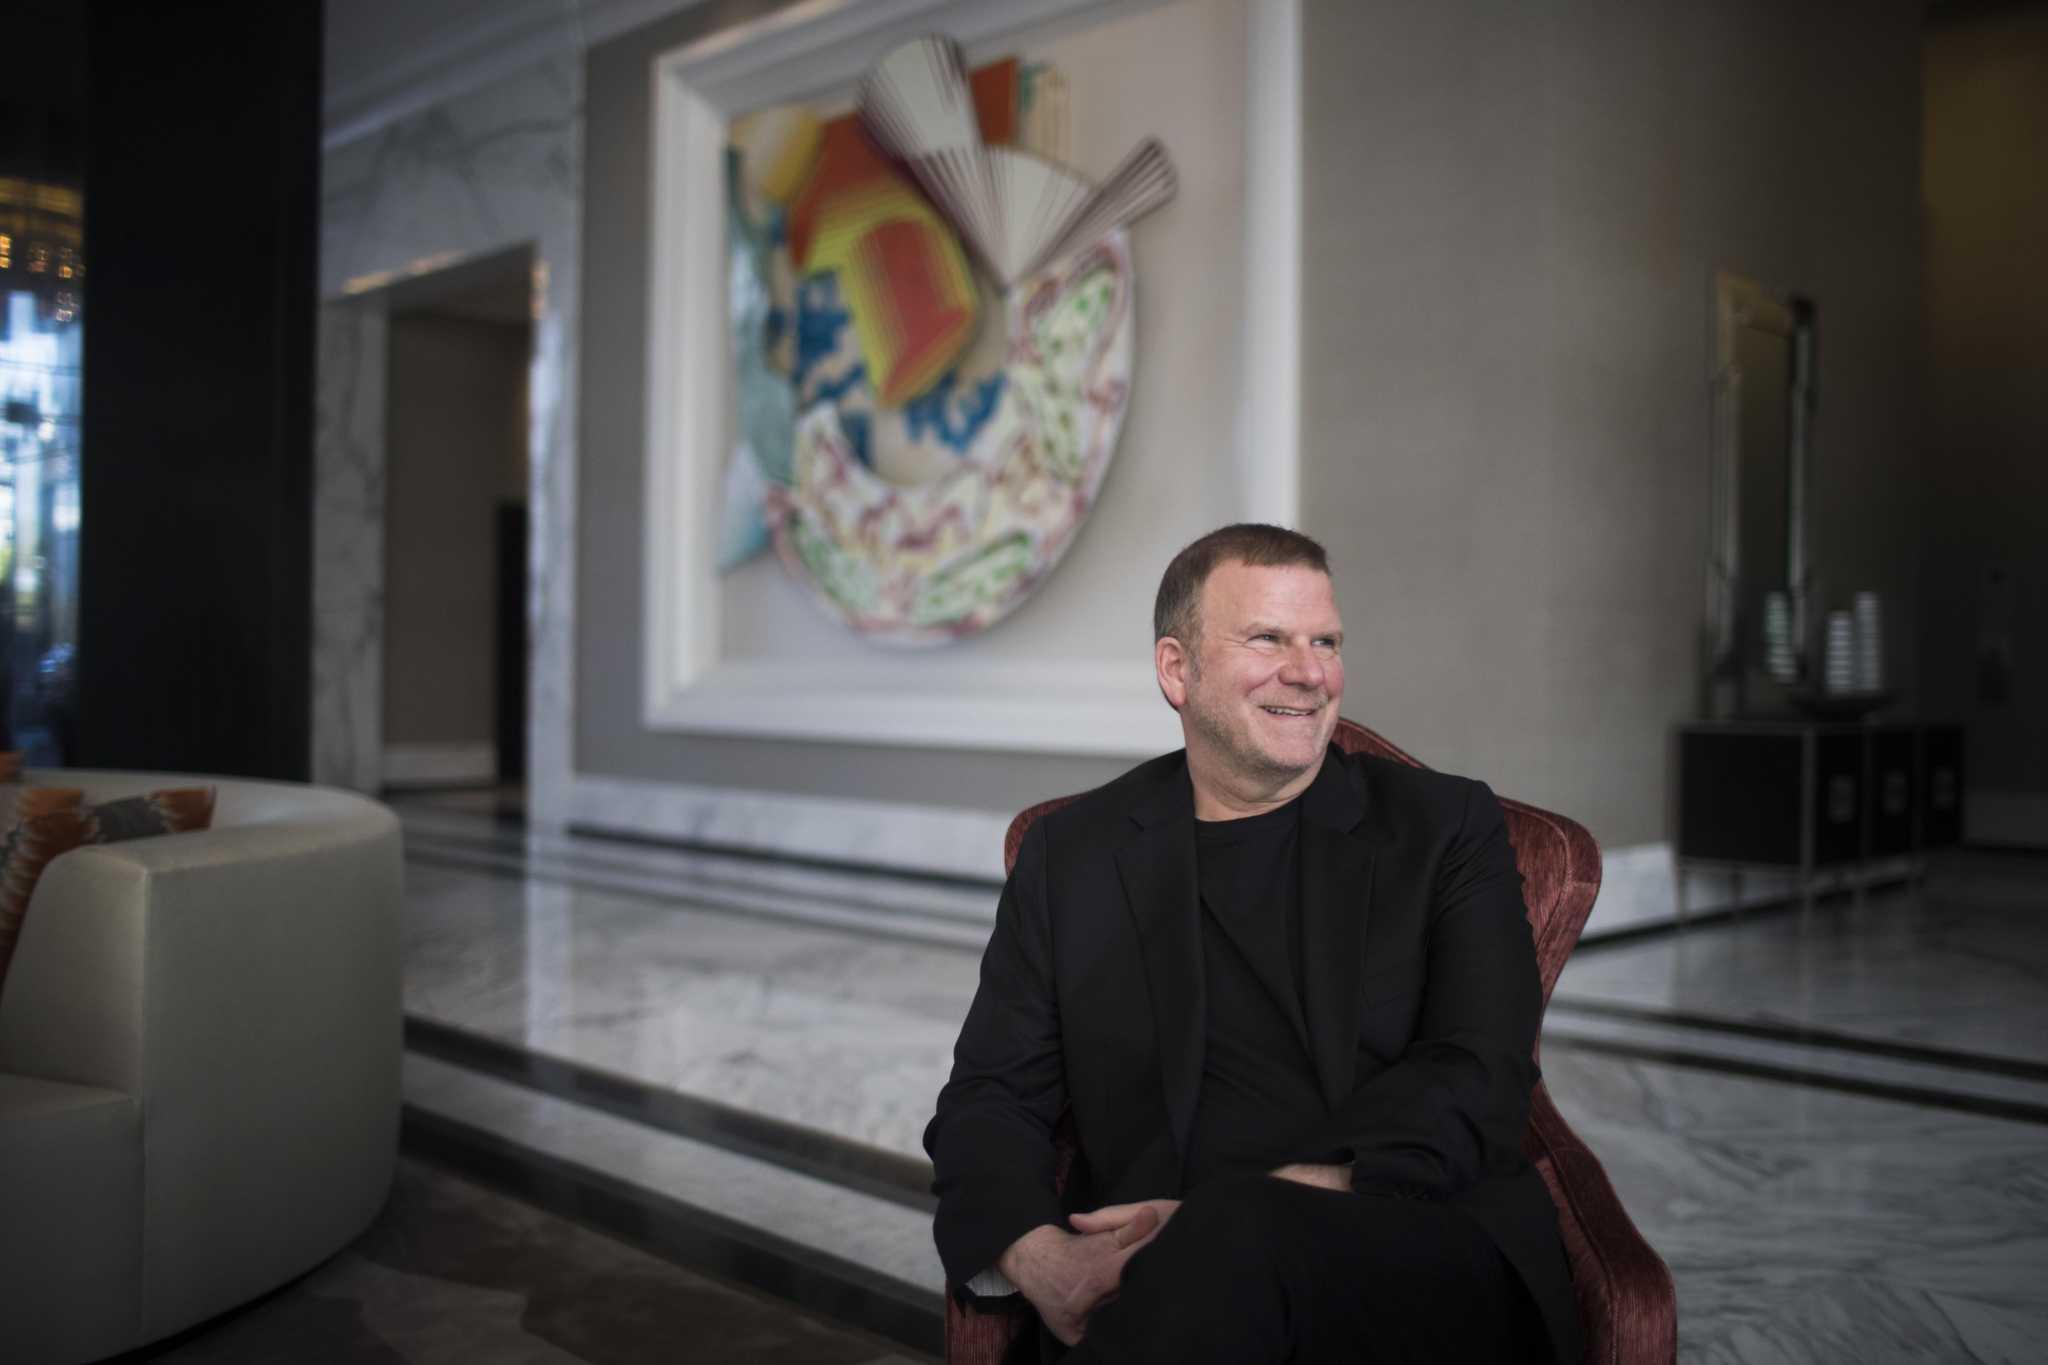 Tilman Fertitta seeks to merger Golden Nugget with Caesars:sources